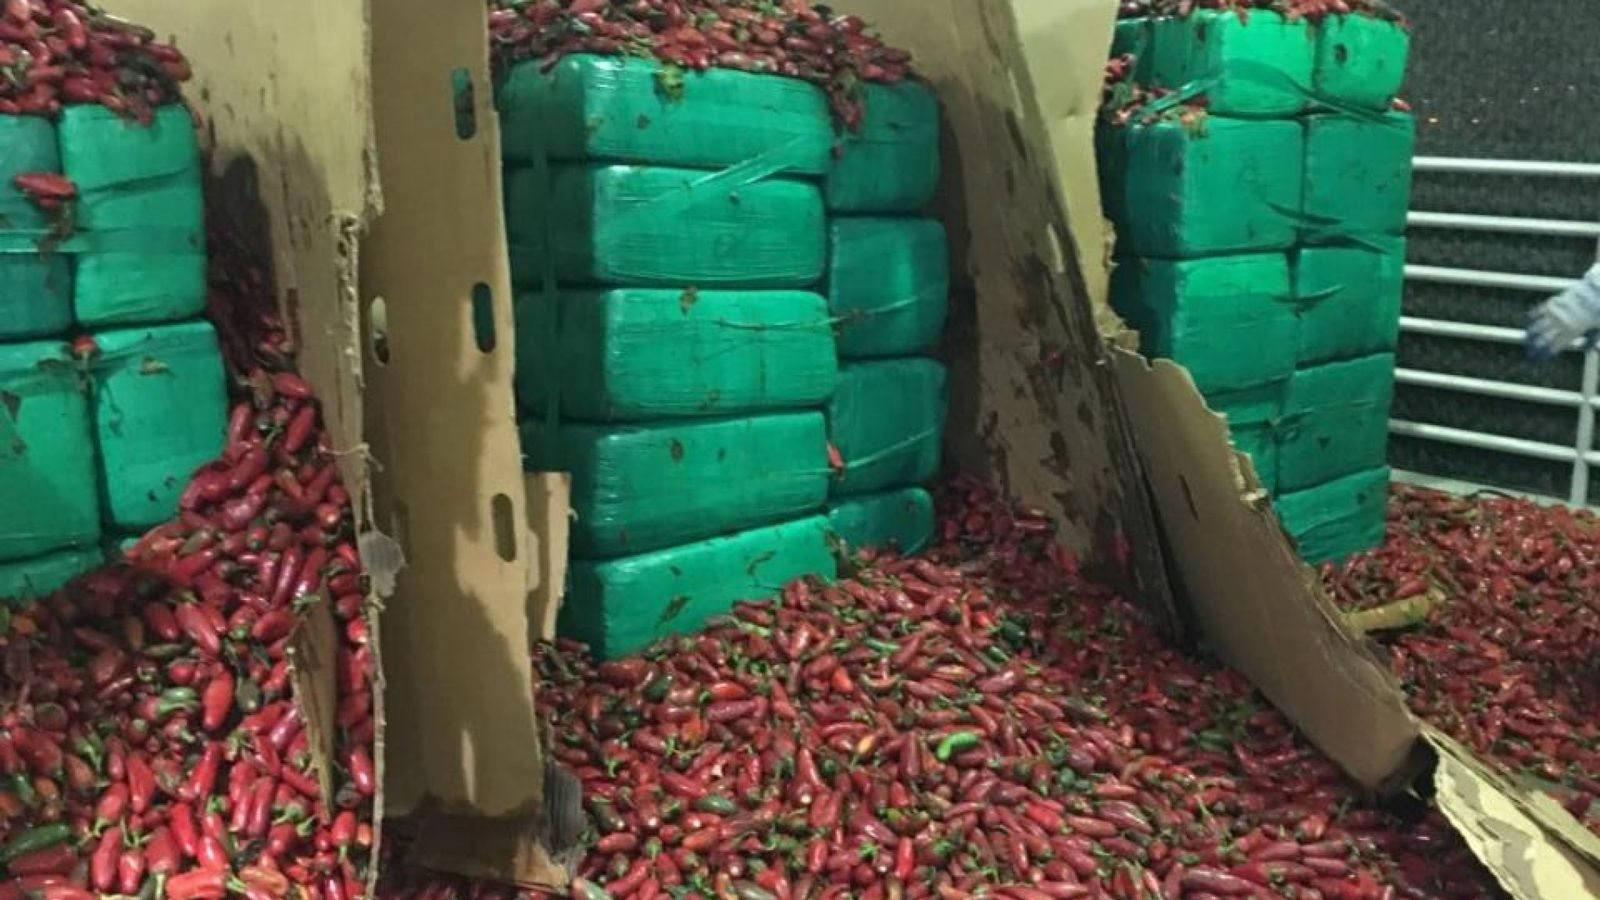 US Customs stops 3 tonnes of marijuana entering country